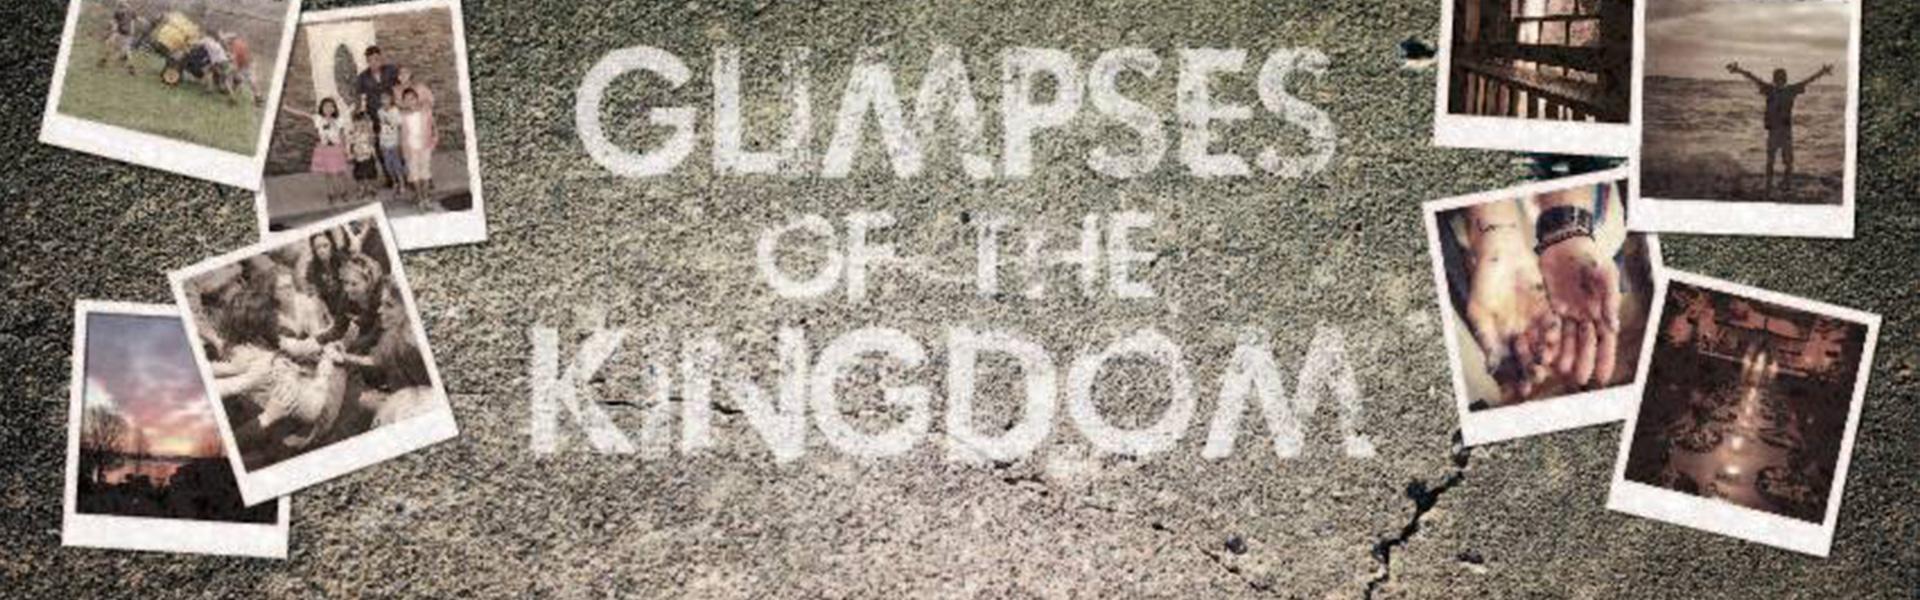 Glimpses of The Kingdom